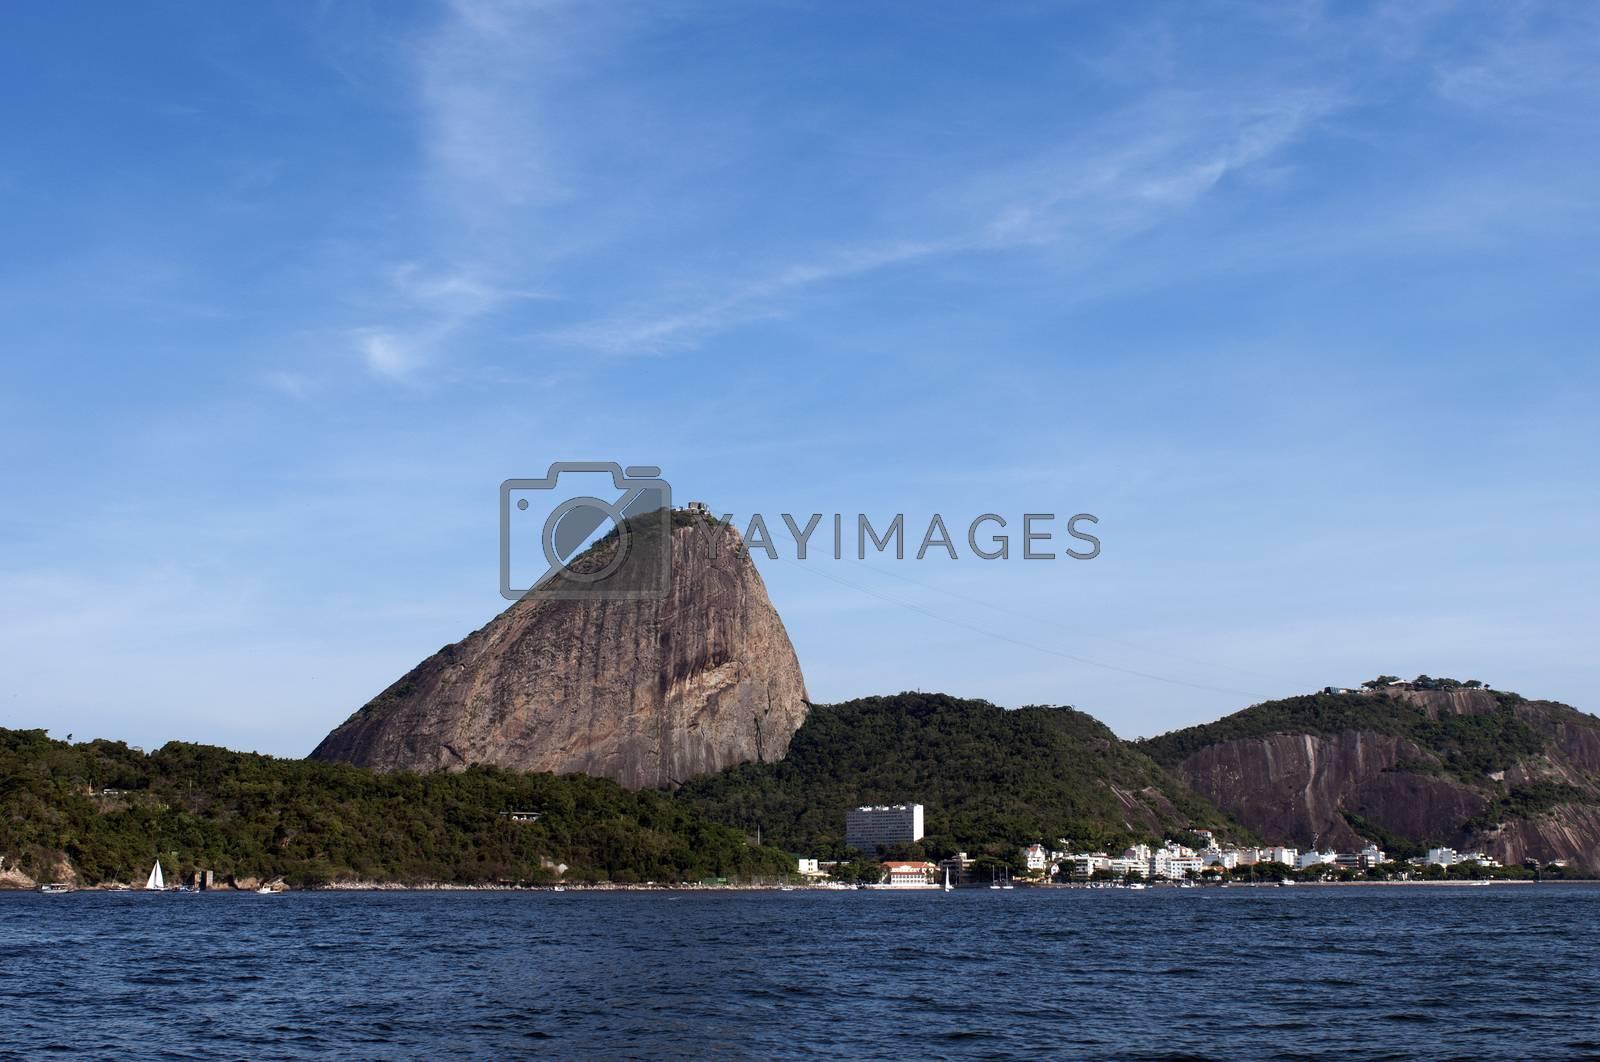 Royalty free image of Sugarloaf Mountain, Rio de Janeiro - Brazil by rodrigobellizzi